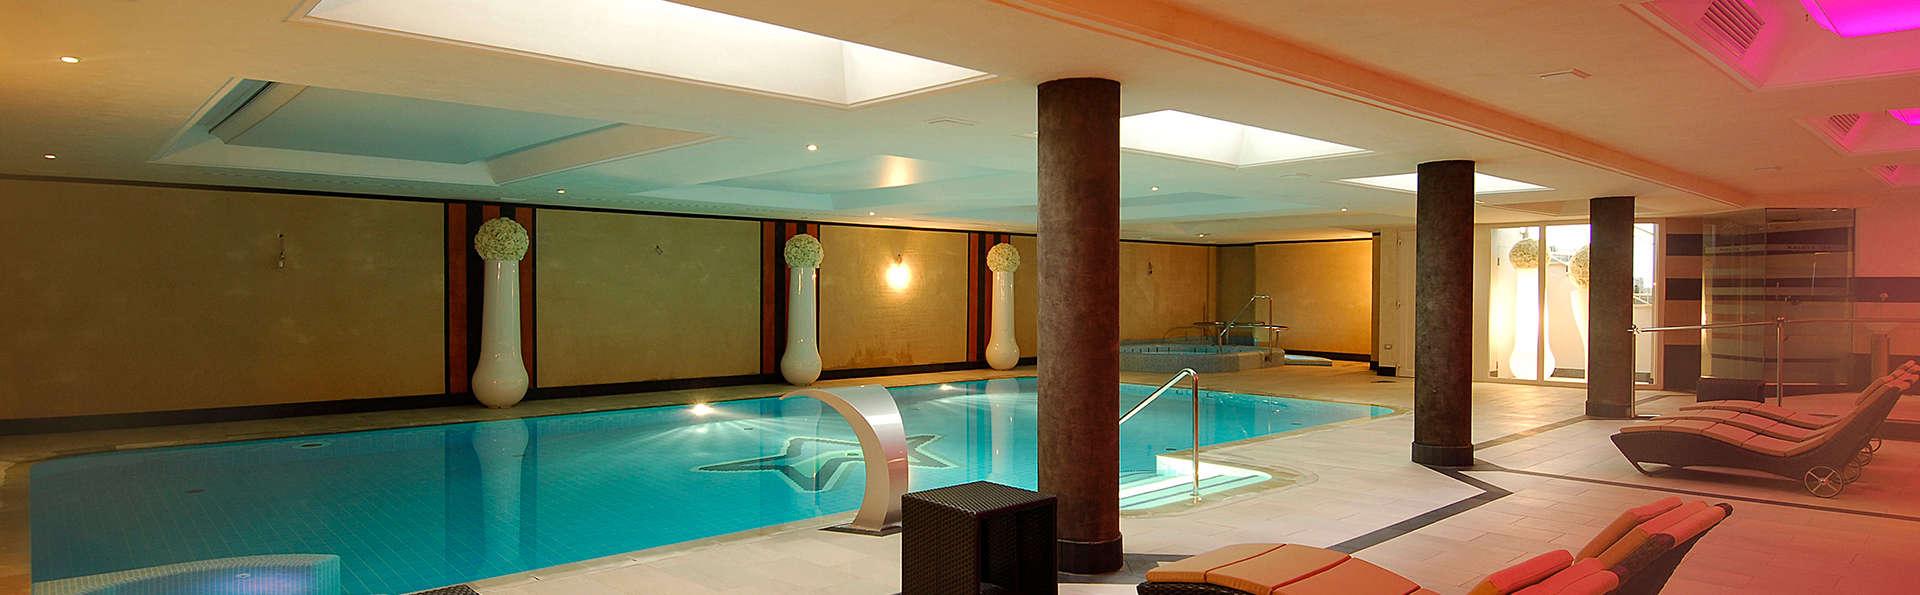 Weekend Weekendeals Scansano con accesso alla spa a partire da 80€